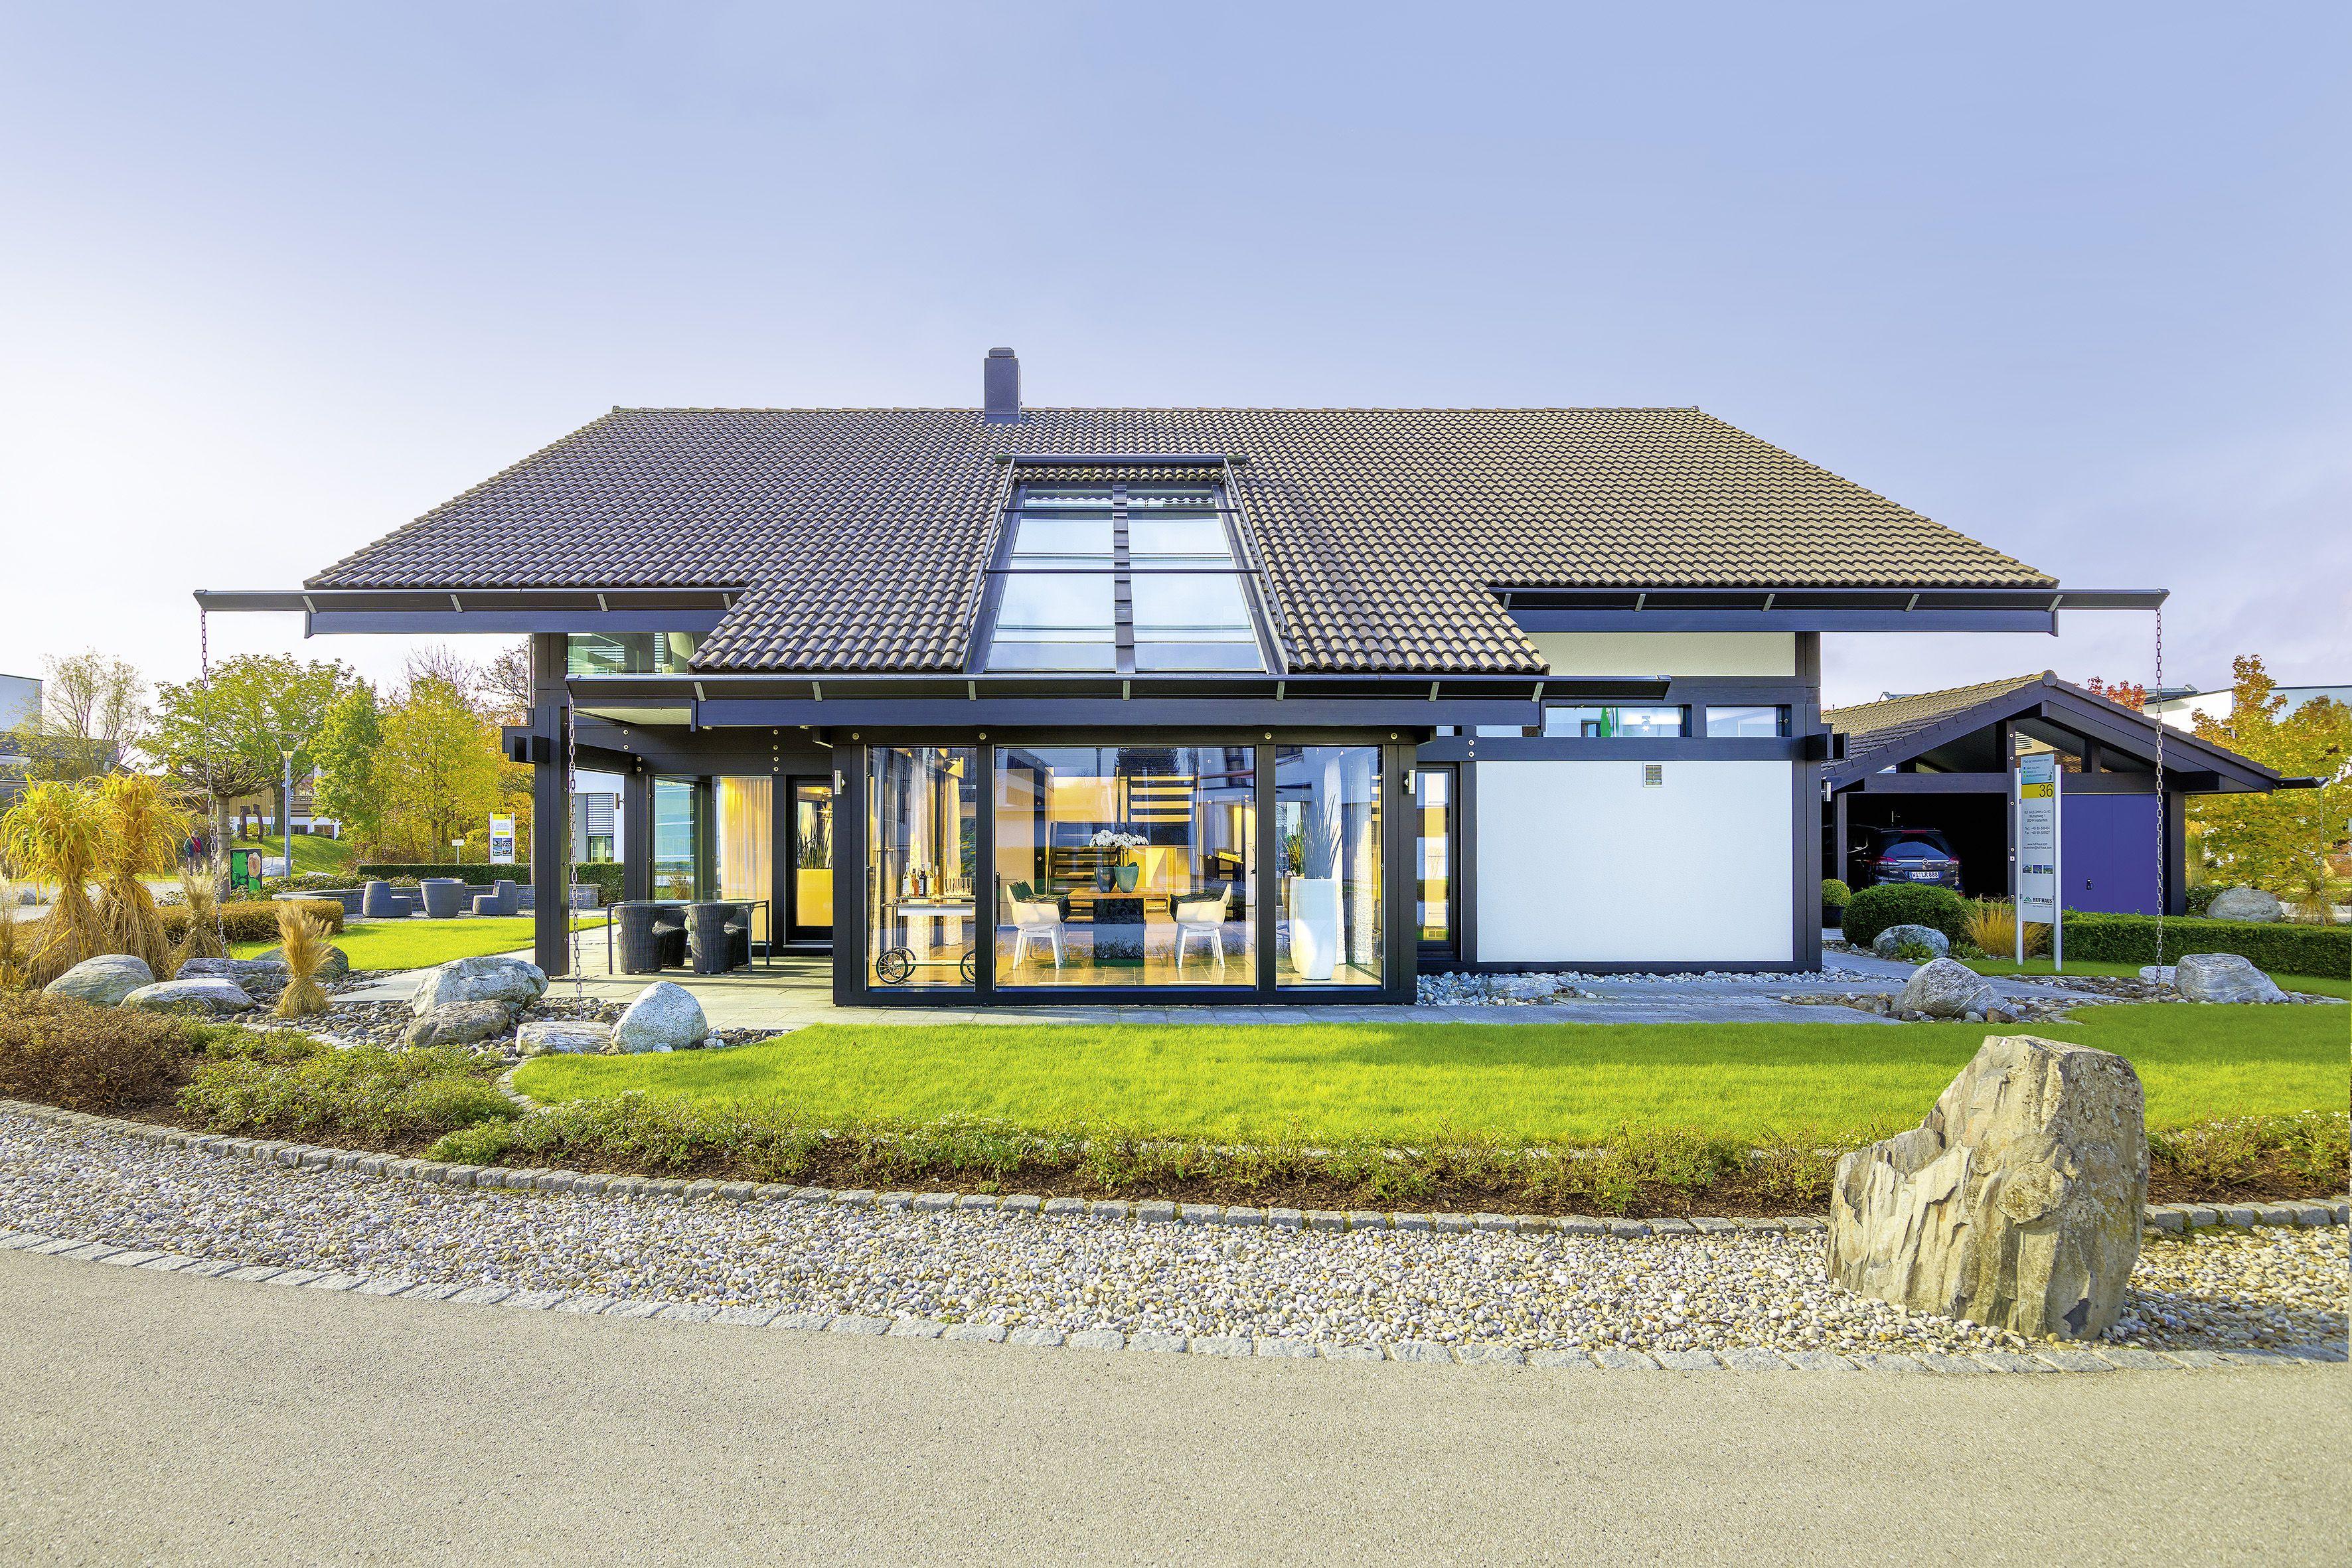 Musterhaus Musterhaus Online Haus, Musterhaus, Haus